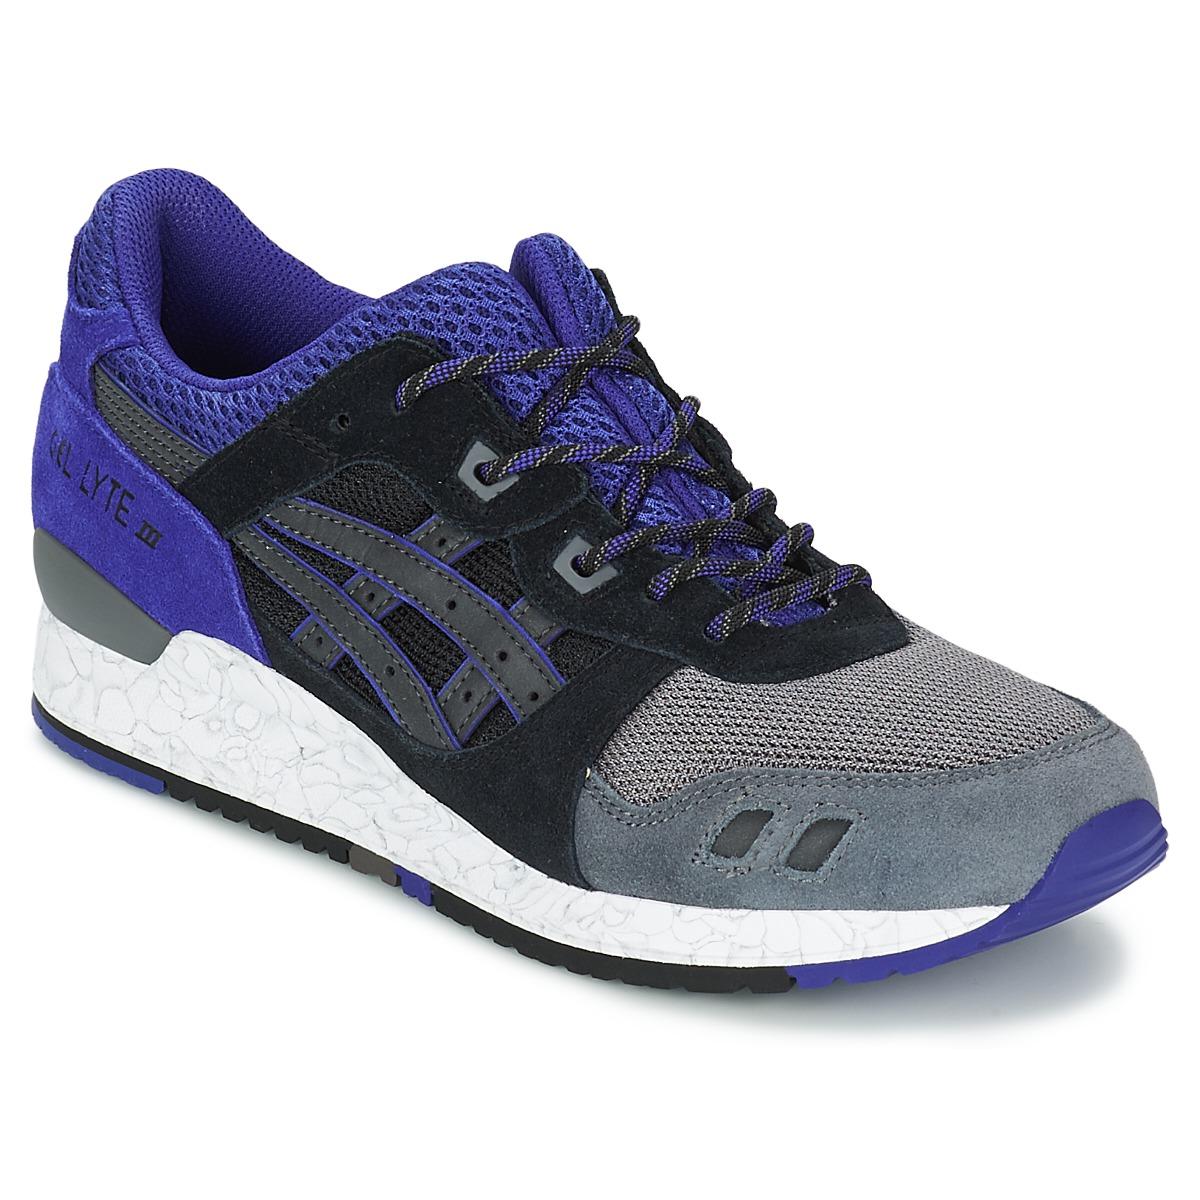 Asics GEL-LYTE III Black / Blue